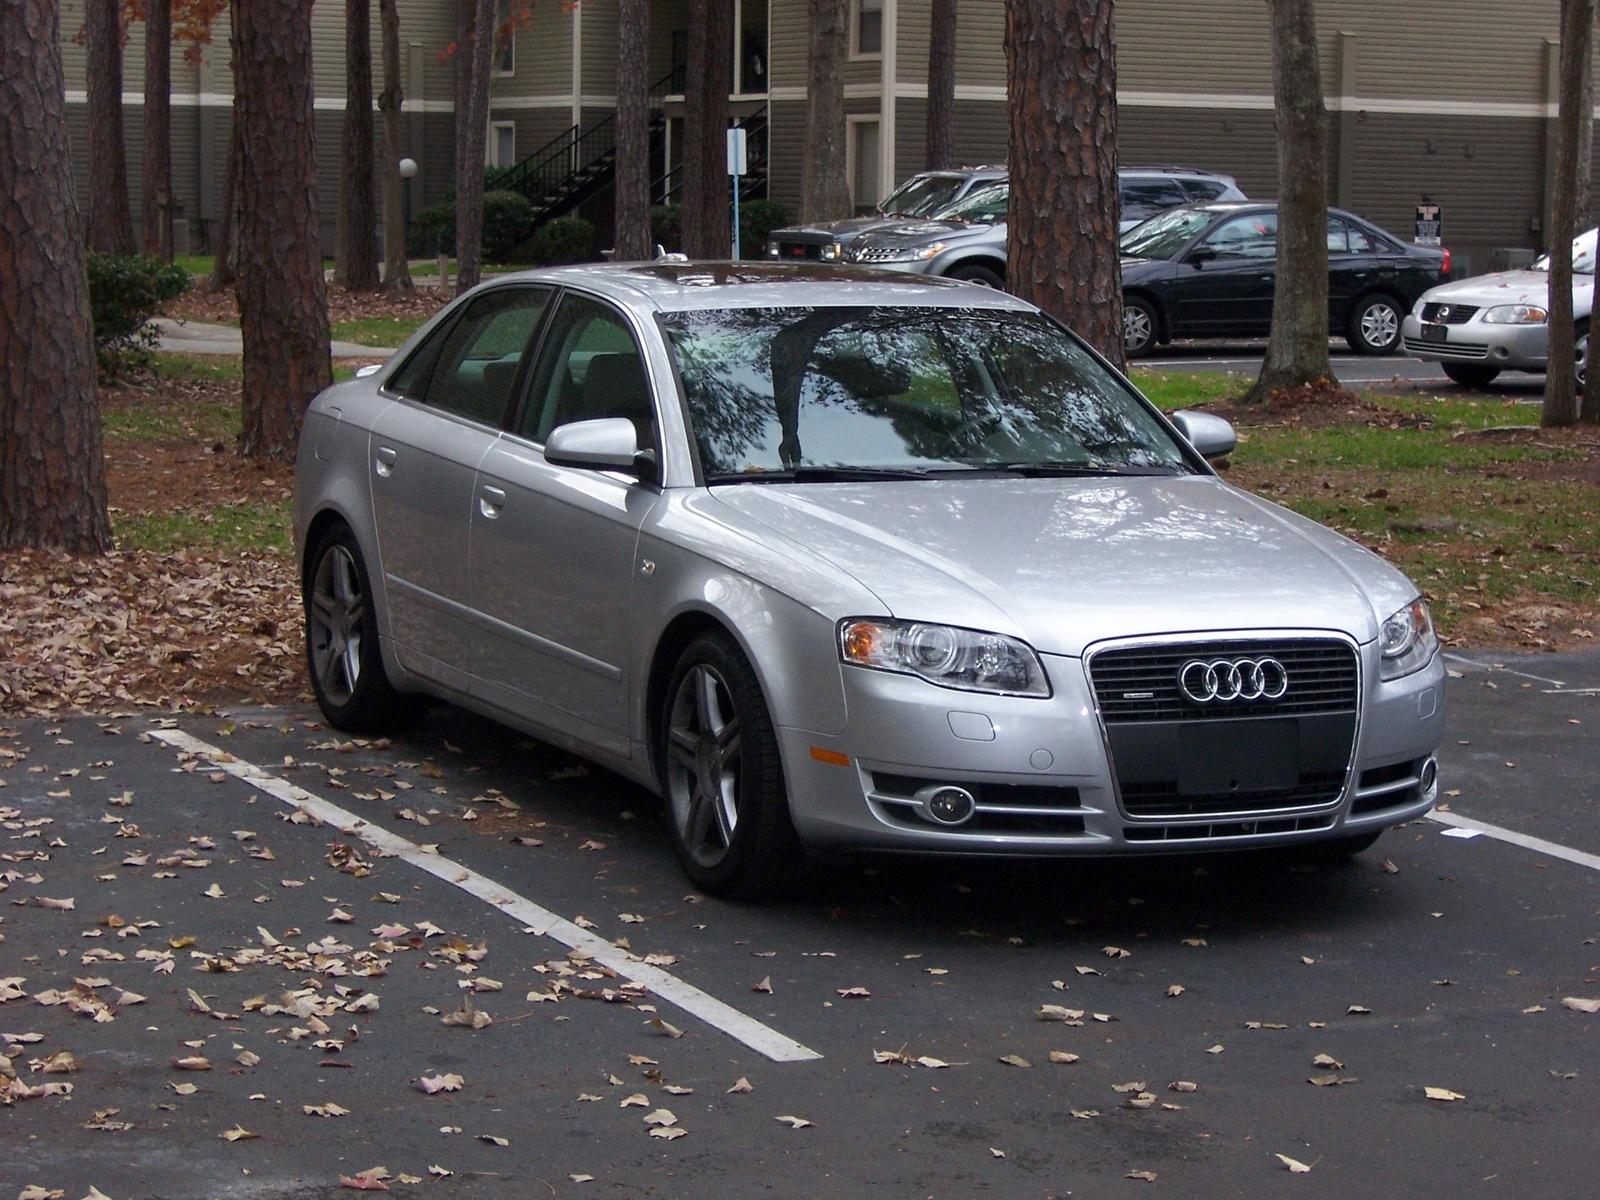 2005 Audi A4 Image 15